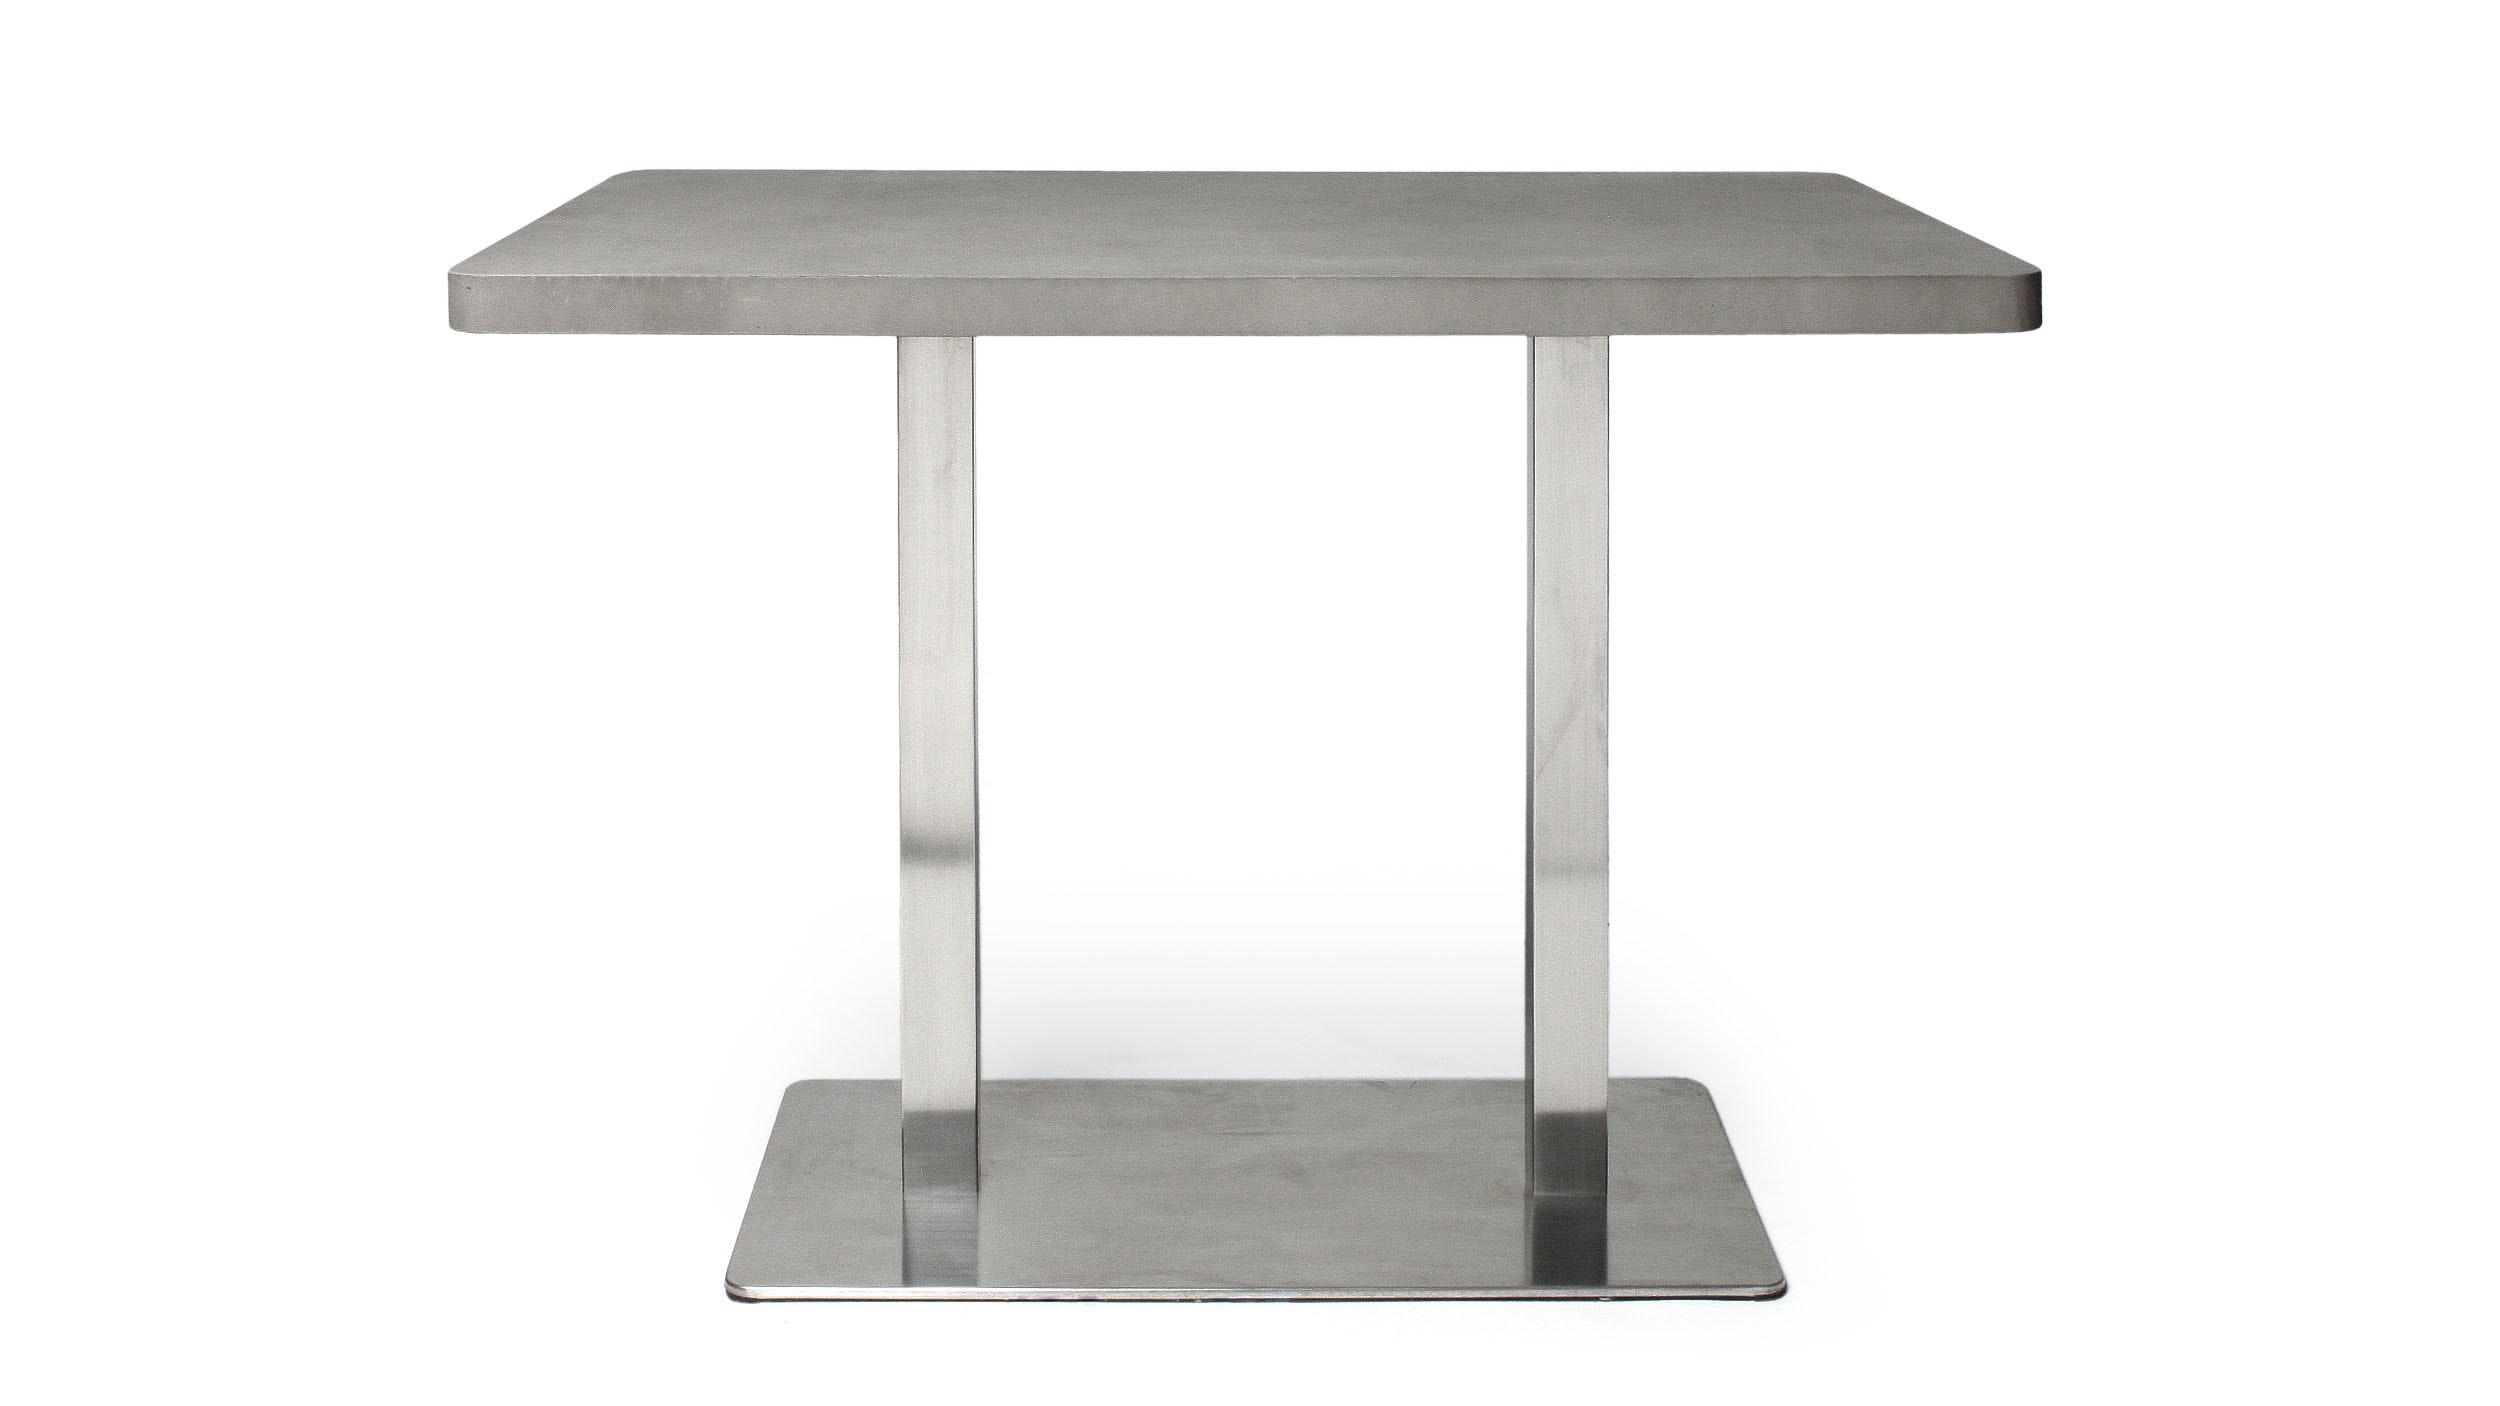 Dl 09072 Sl 106 1 Bistro Rectangular Dining Table 00002